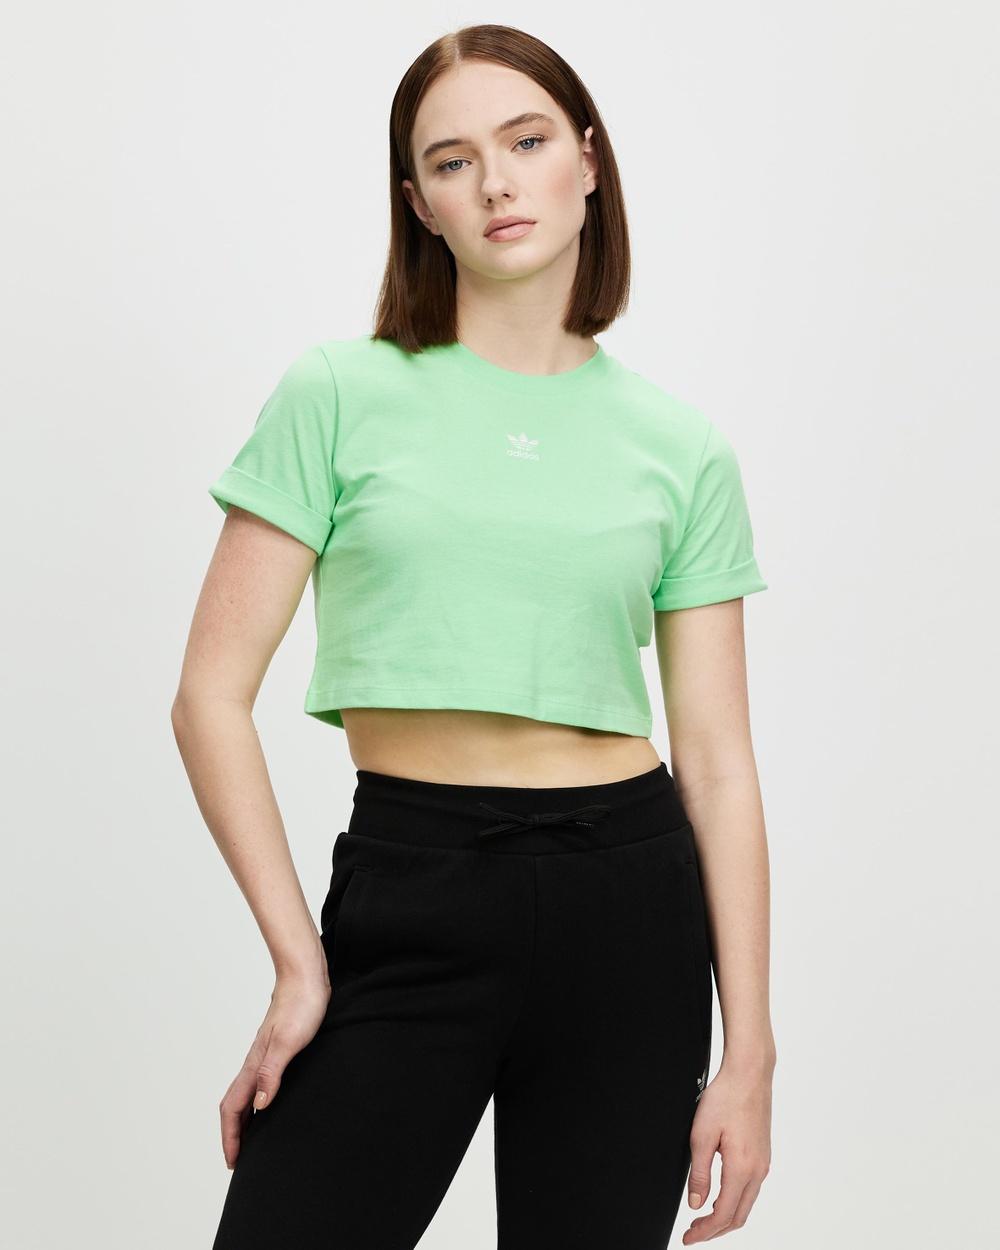 adidas Originals Adicolor Essentials Cropped Tee T-Shirts & Singlets Glory Mint